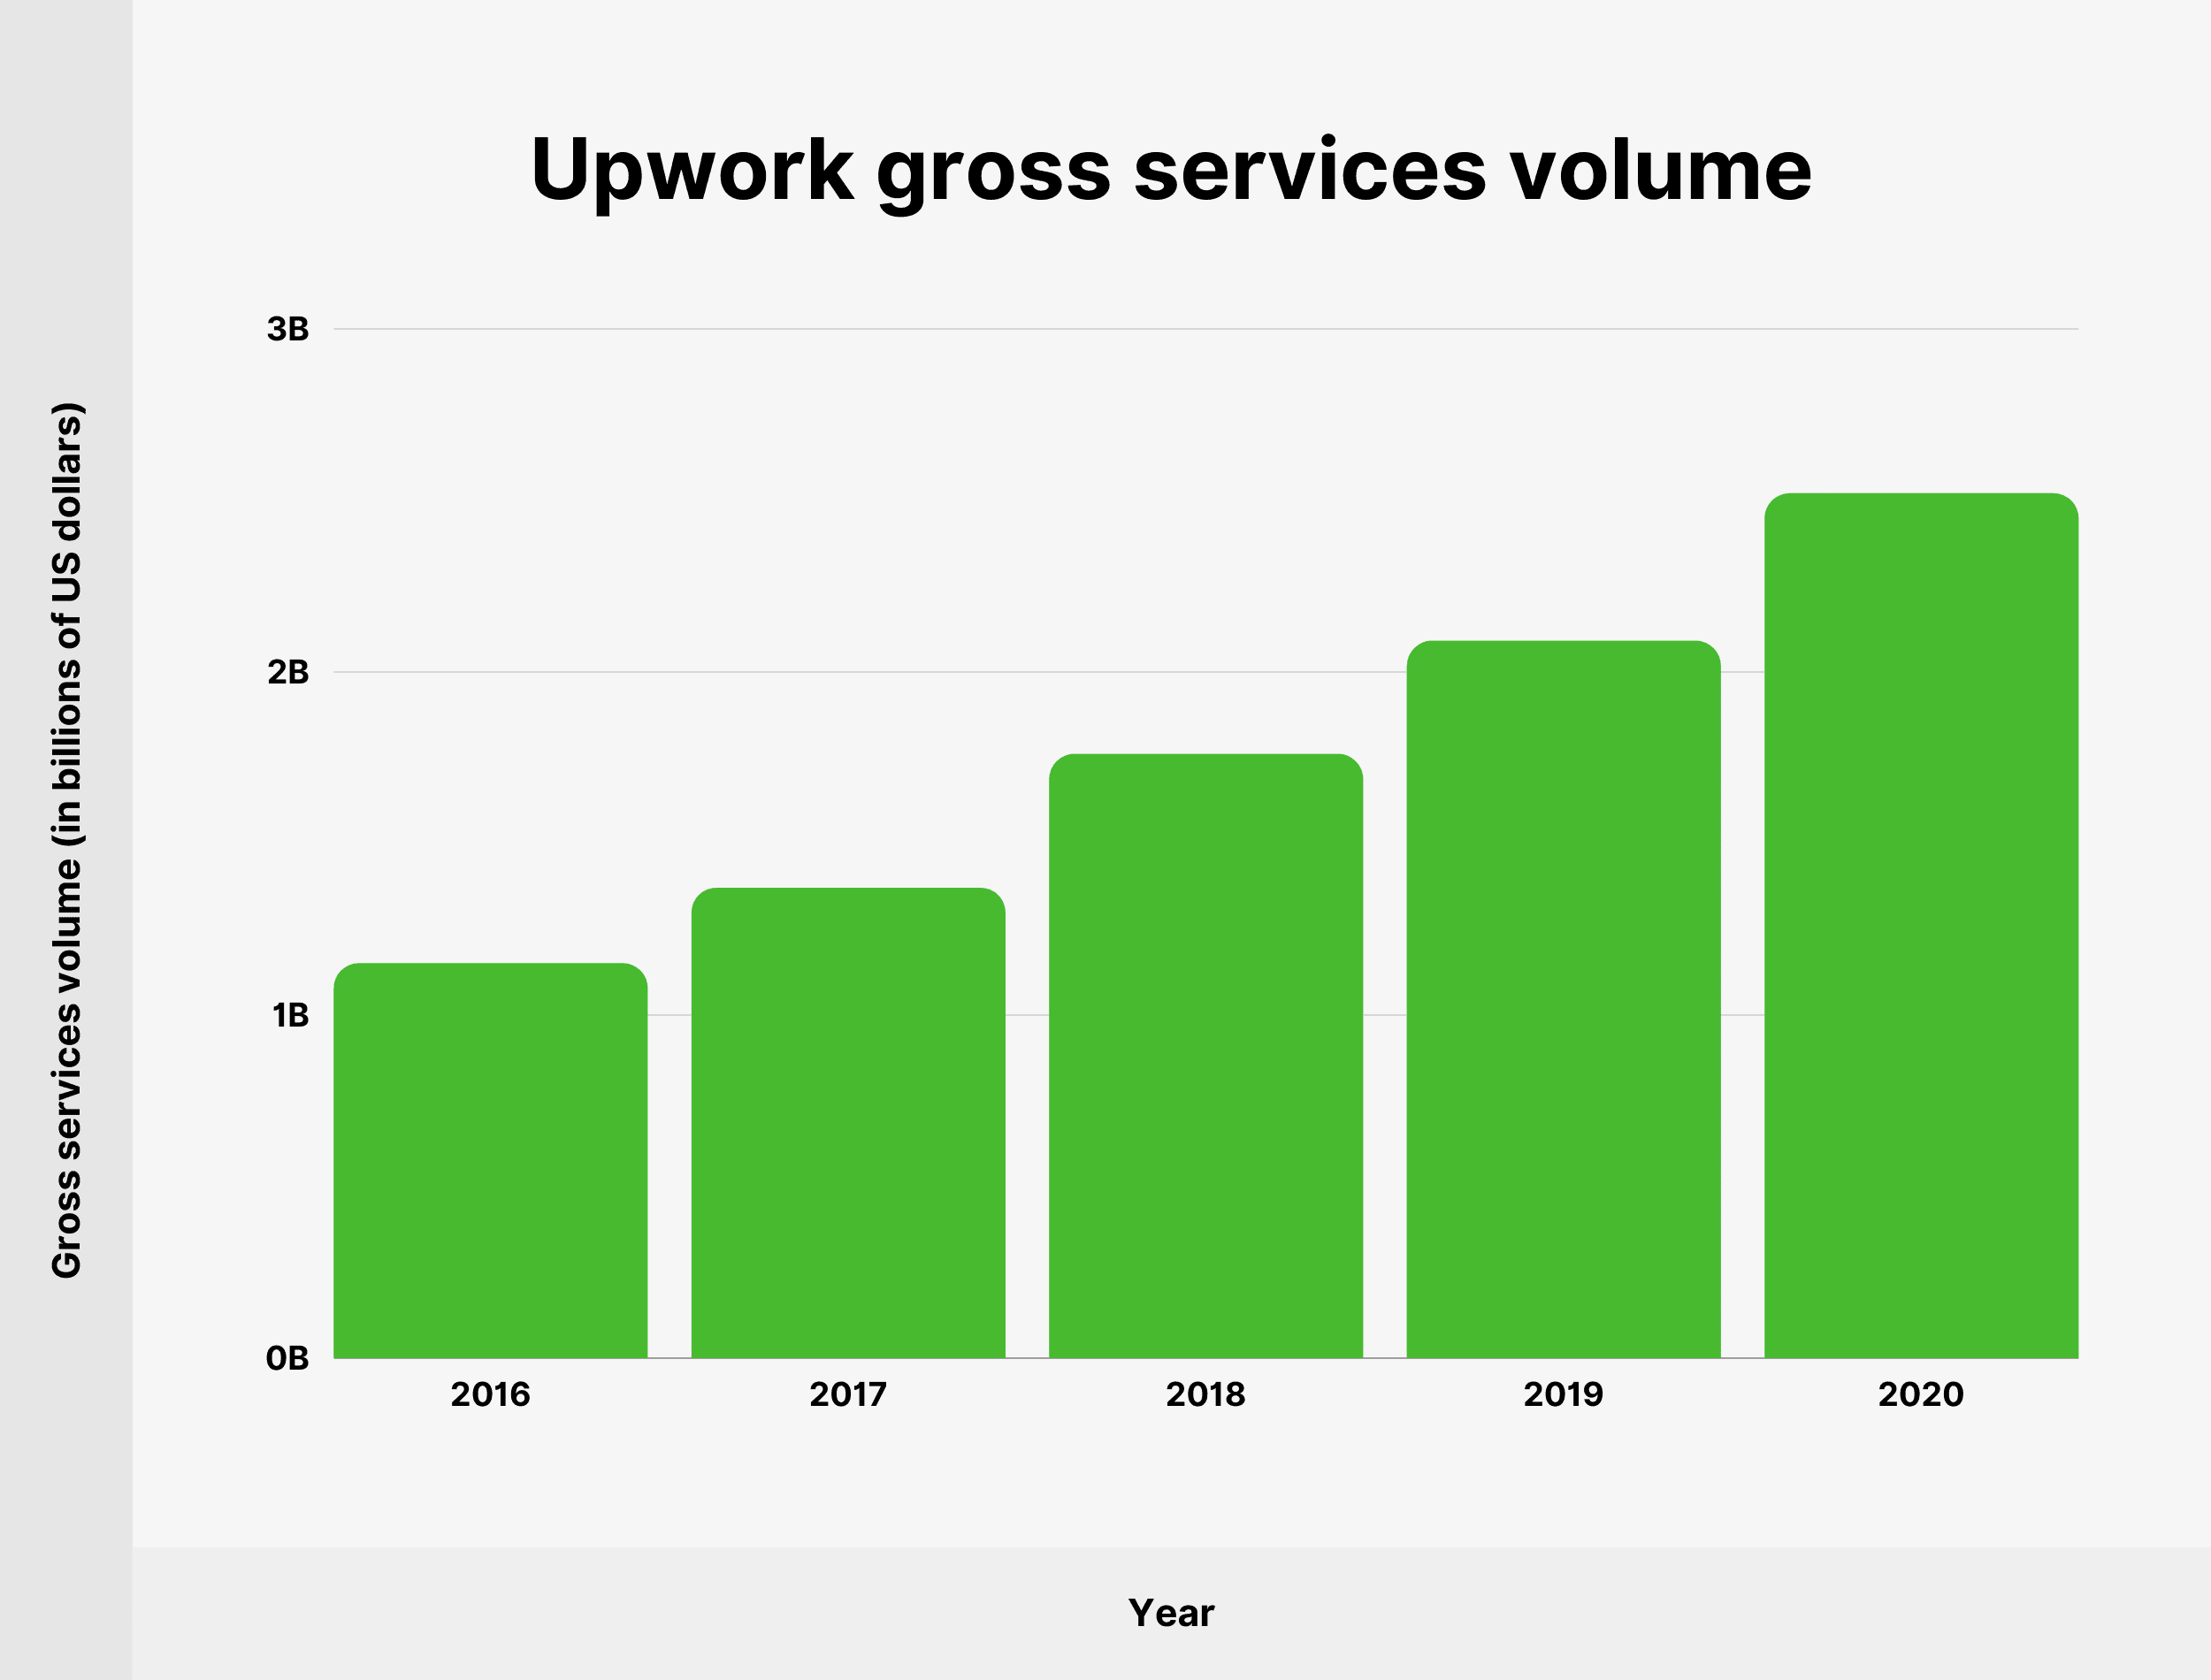 Upwork gross services volume